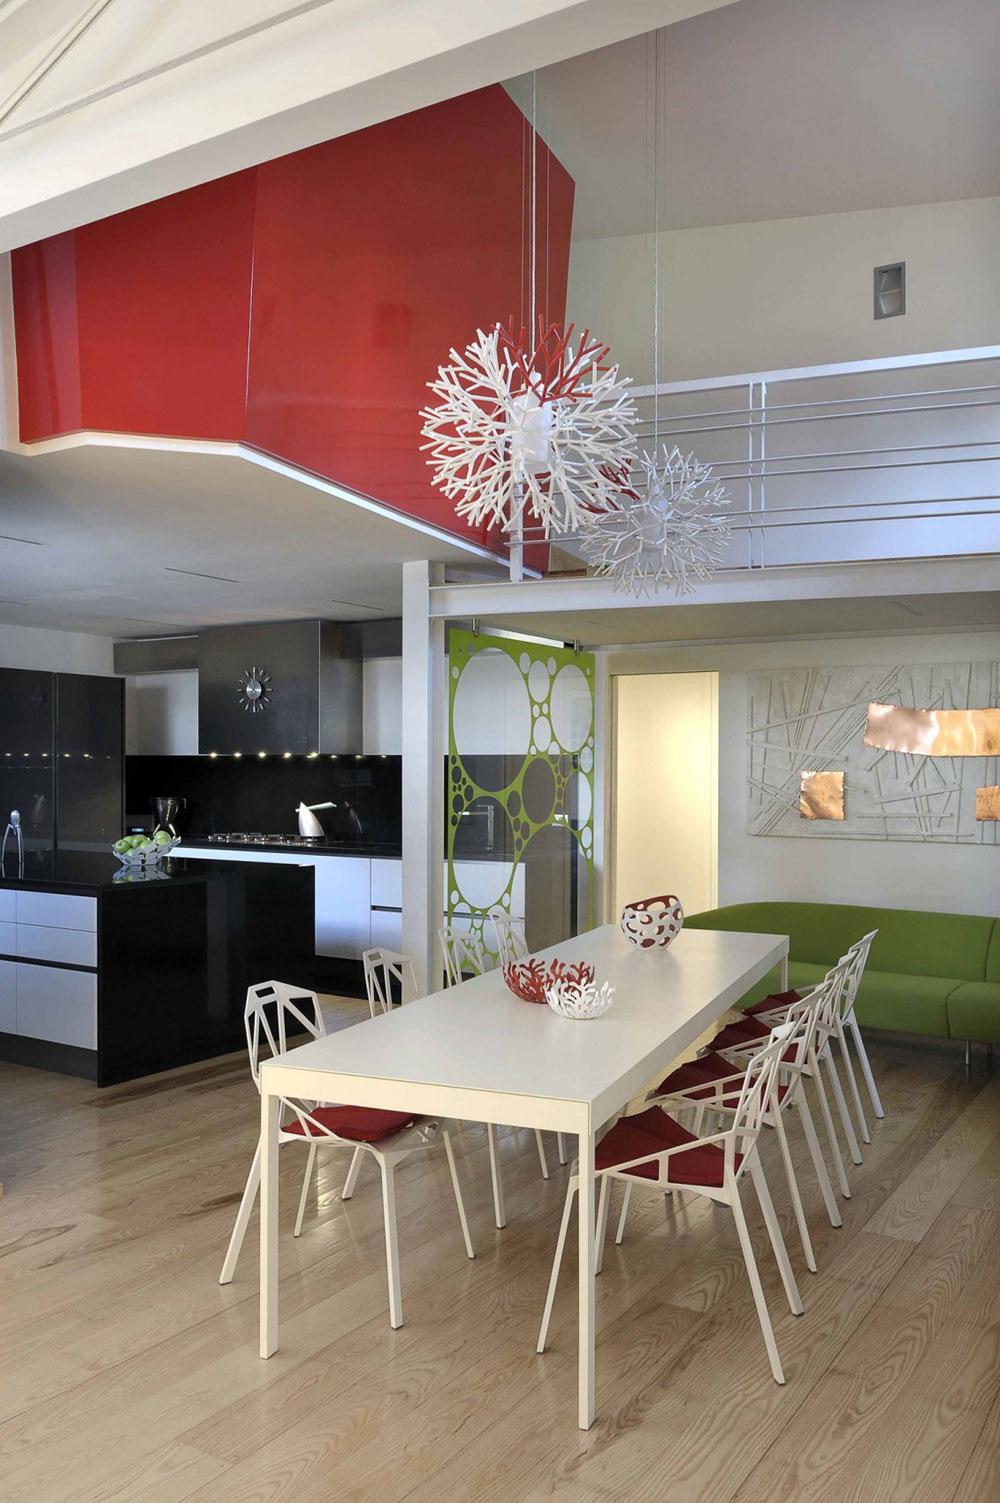 Contemporary-interior-design-styles-to-choose-for-your-home-10 contemporary interior-design-styles to choose from for your home